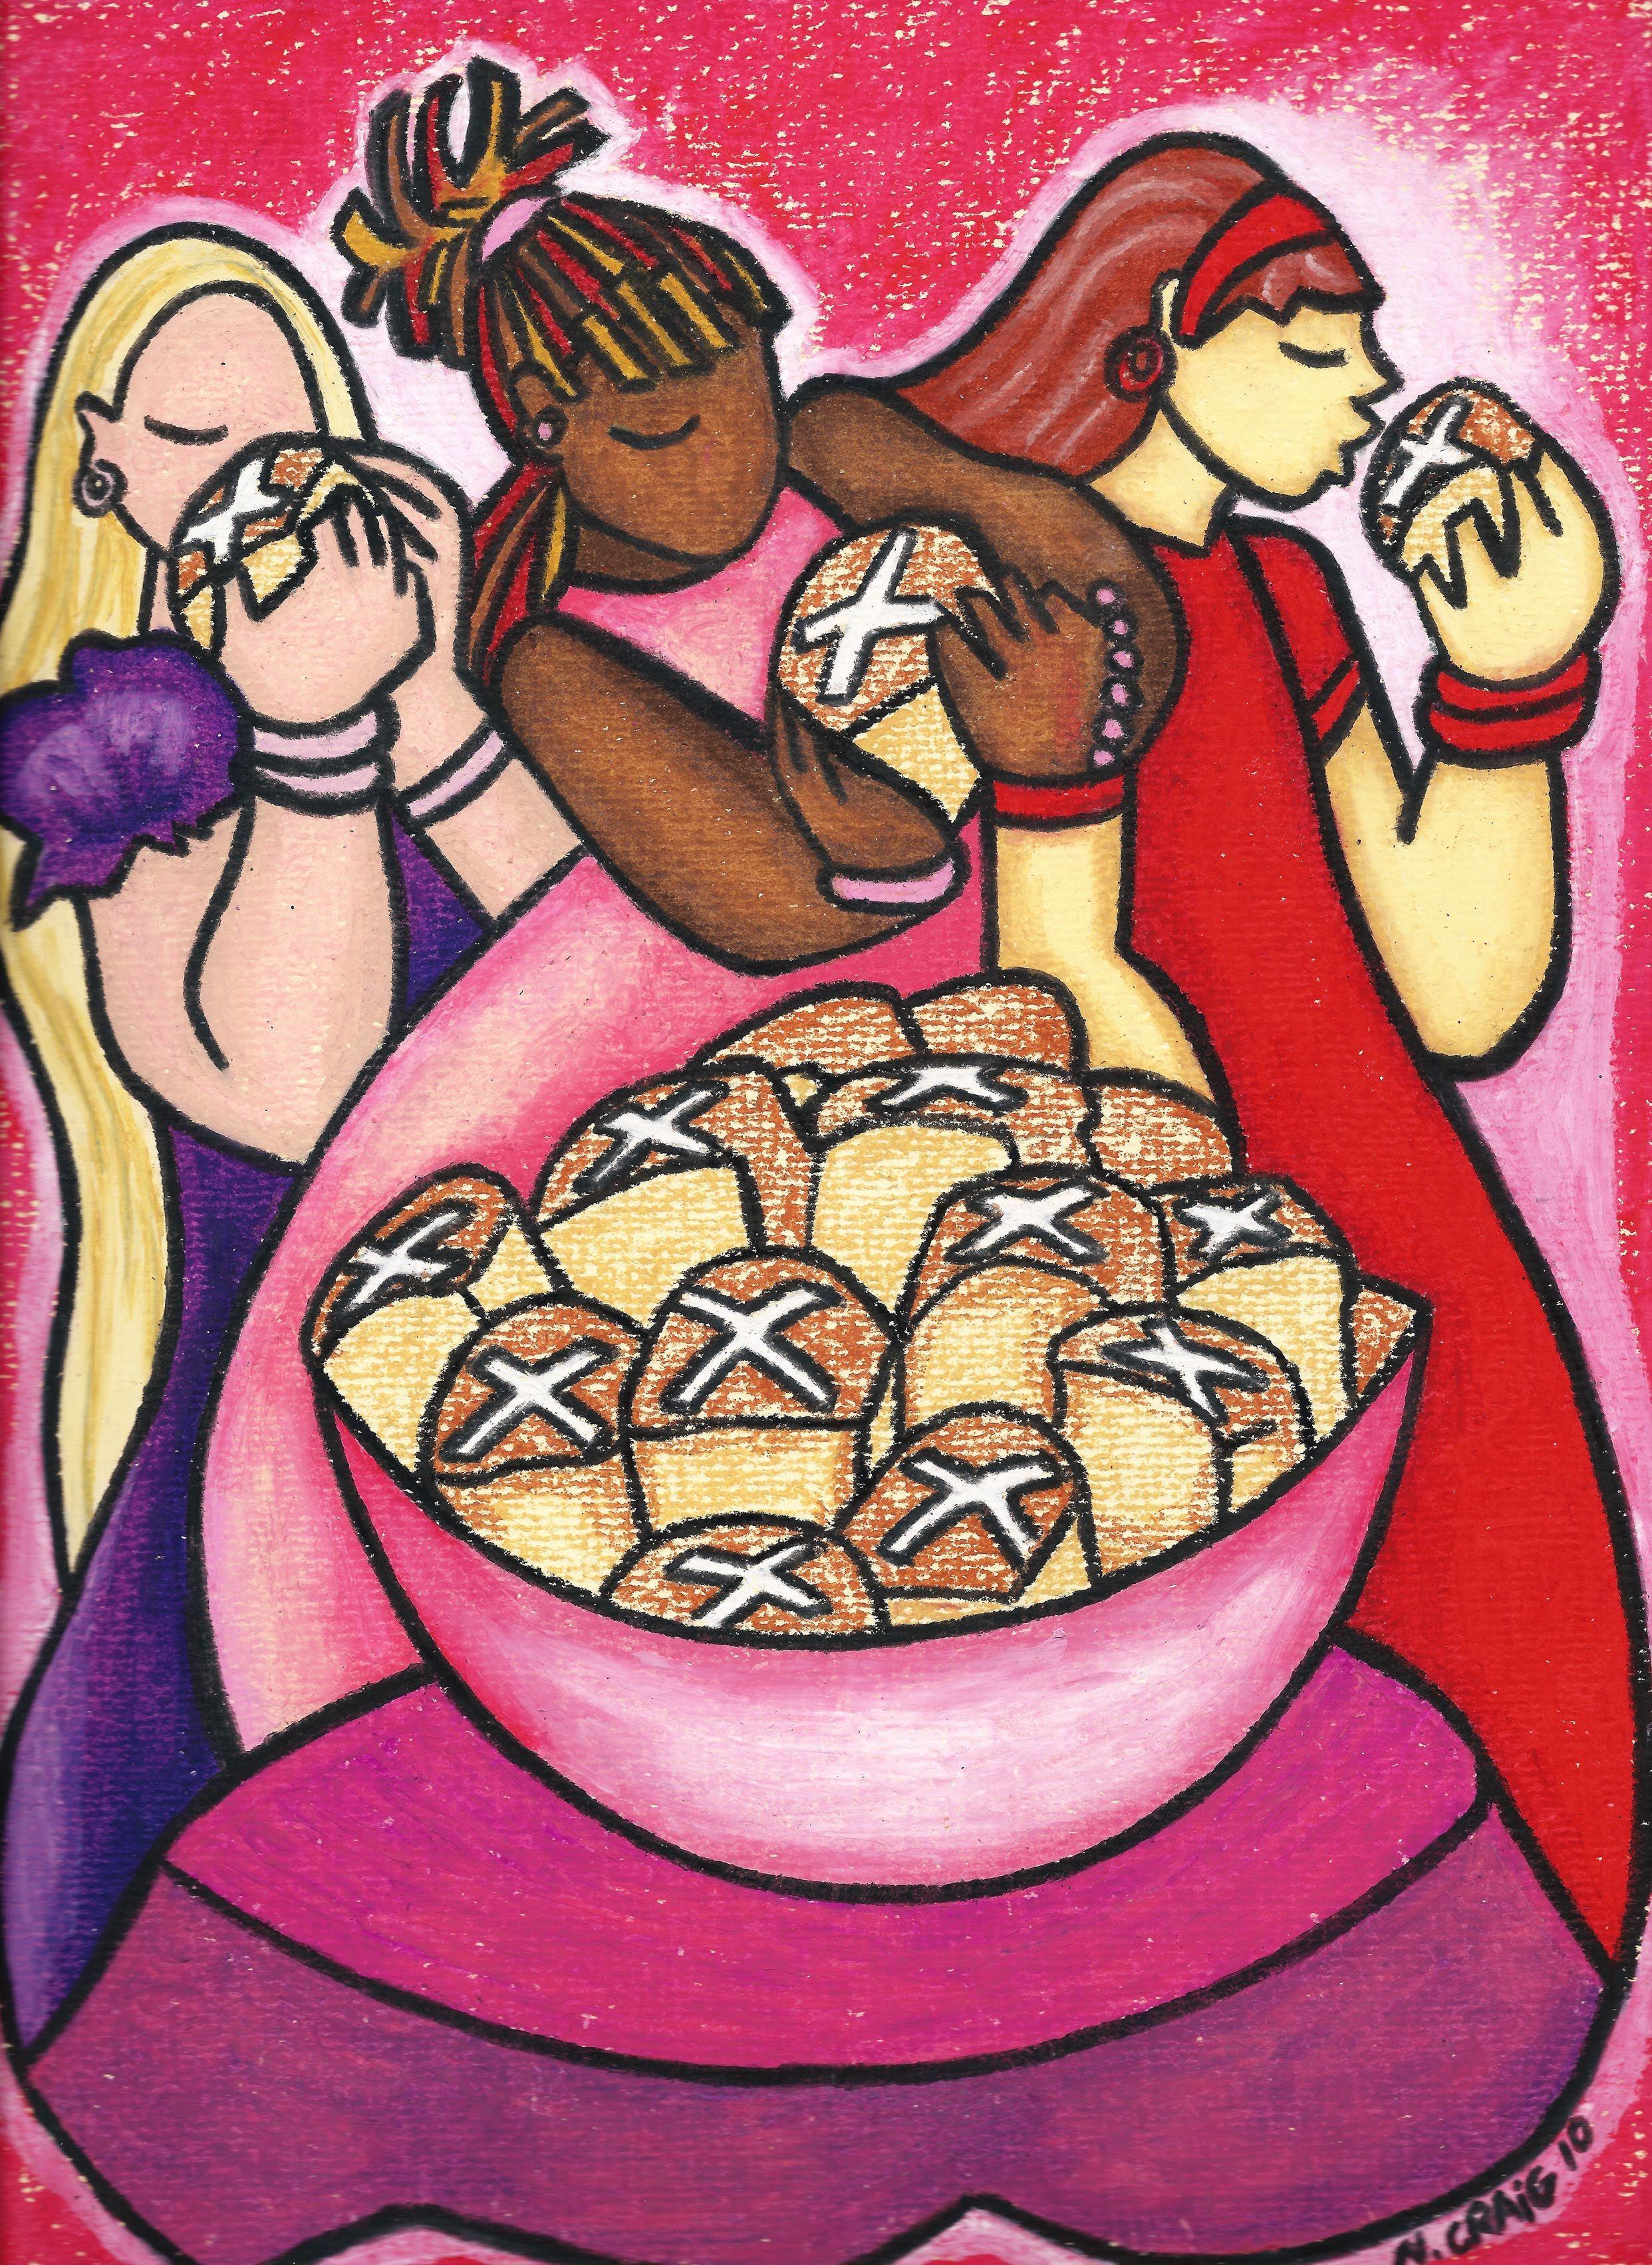 hot cross buns  hot cross buns island girl caribbean